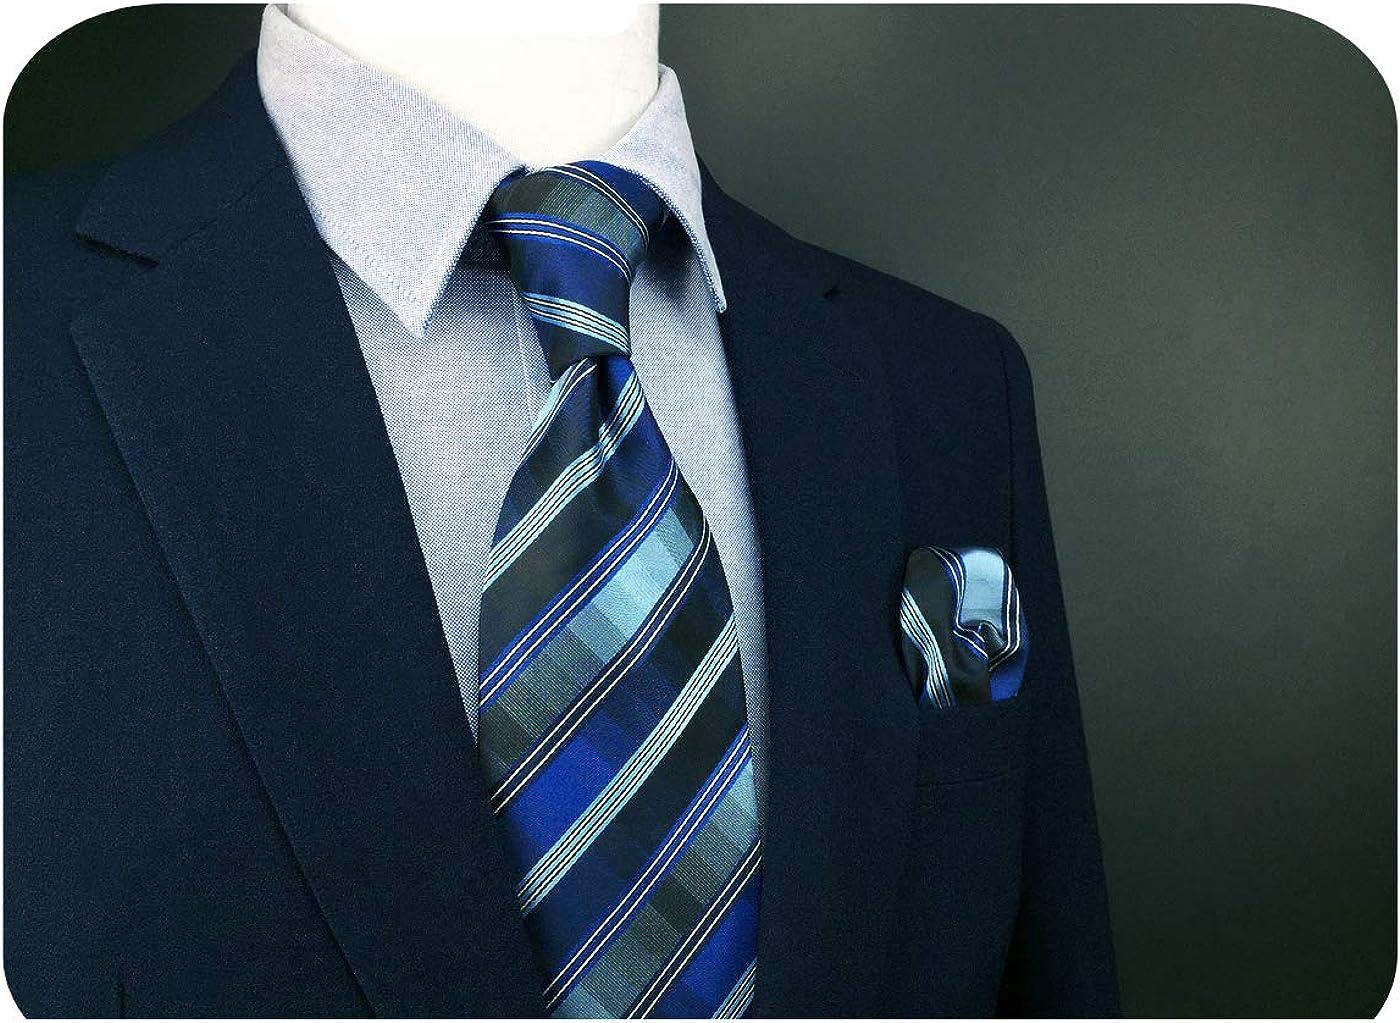 S&W SHLAX&WING Men Ties Dark Blue and Silk Neckties Striped